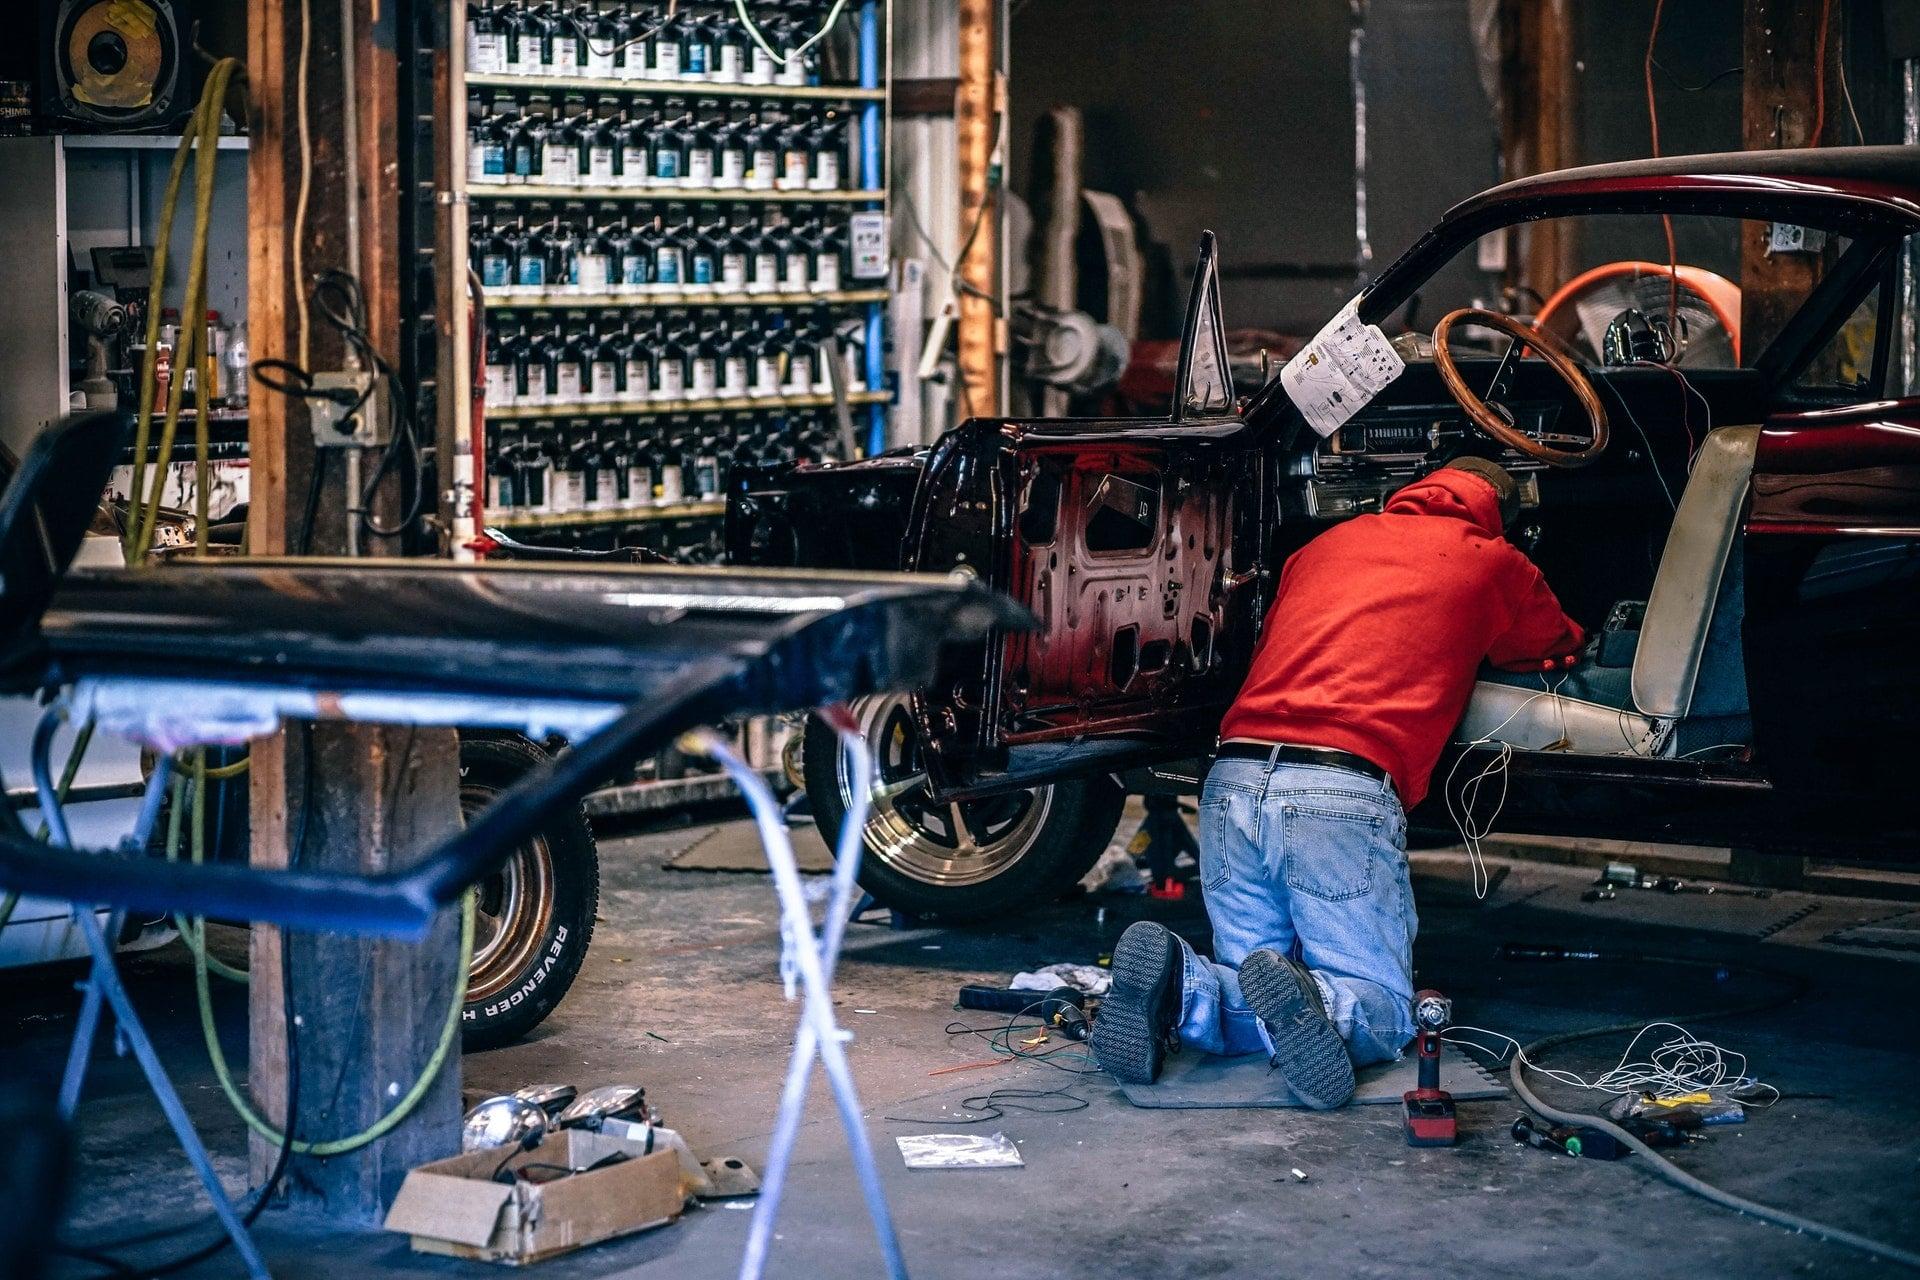 KFZ Mechaniker / Kraftfahrzeugmechatroniker (m/w/d) für US-Cars gesucht in Hanau